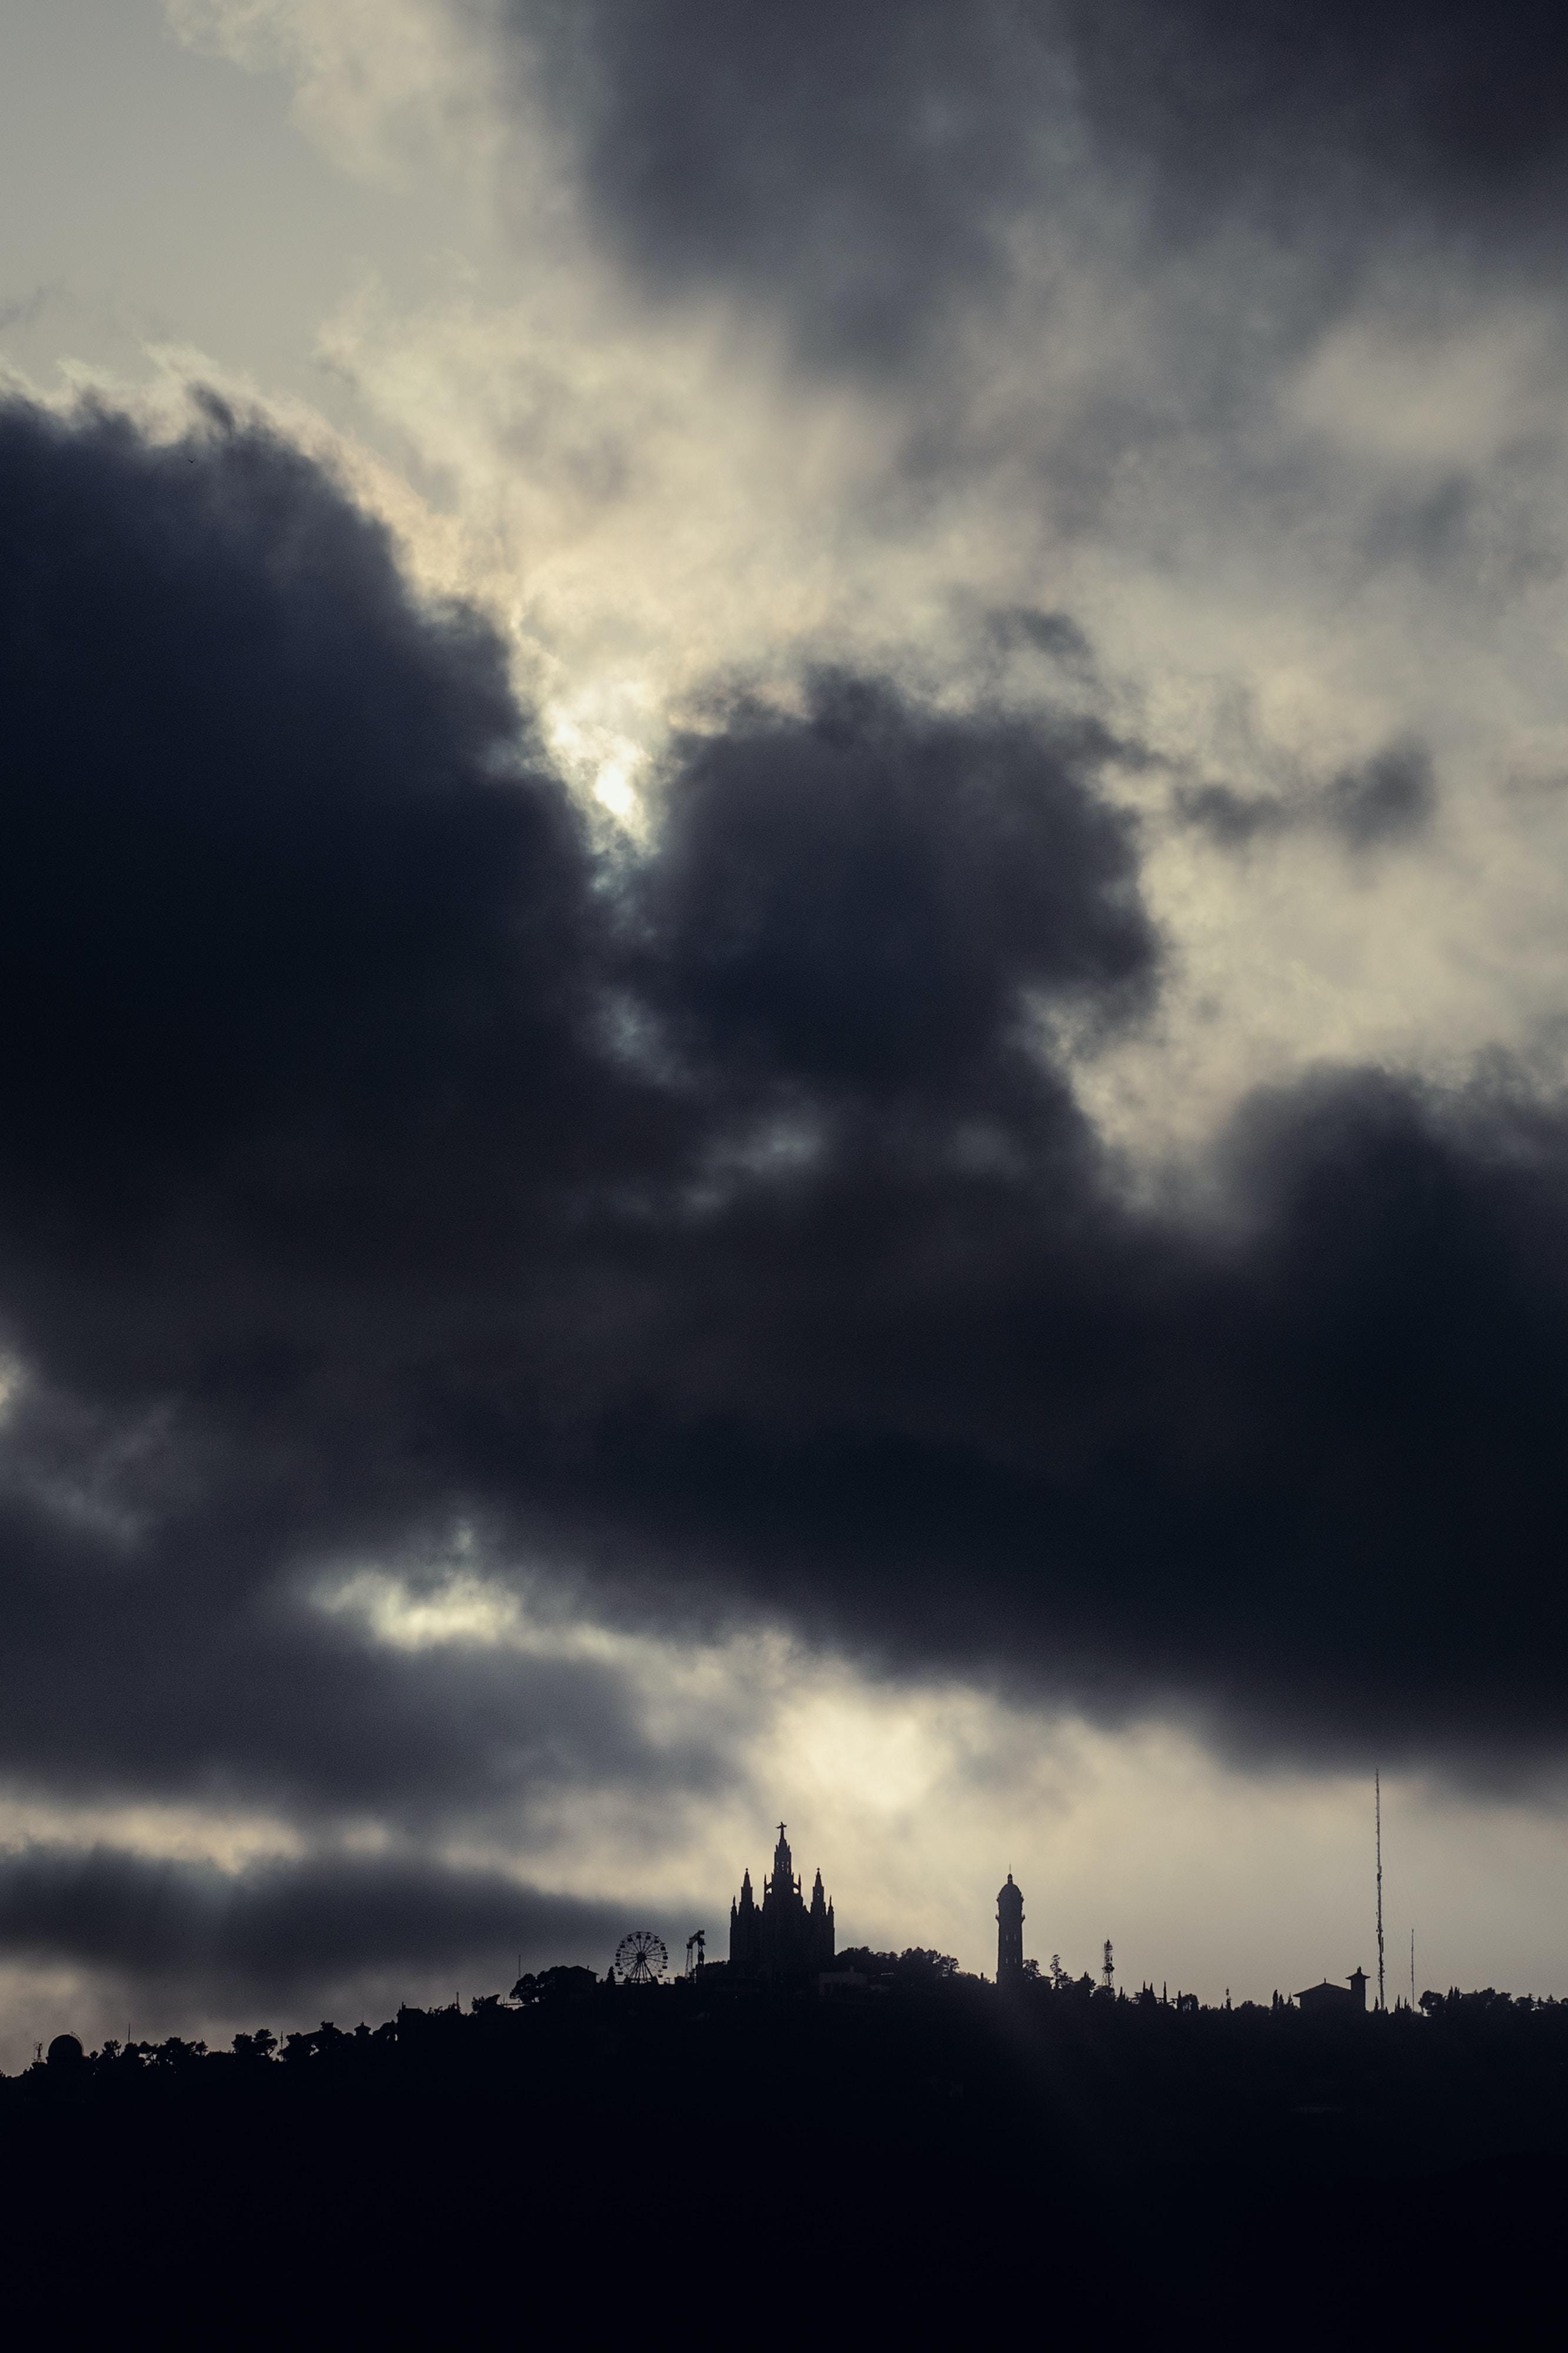 silhouette of buildings under gray sky